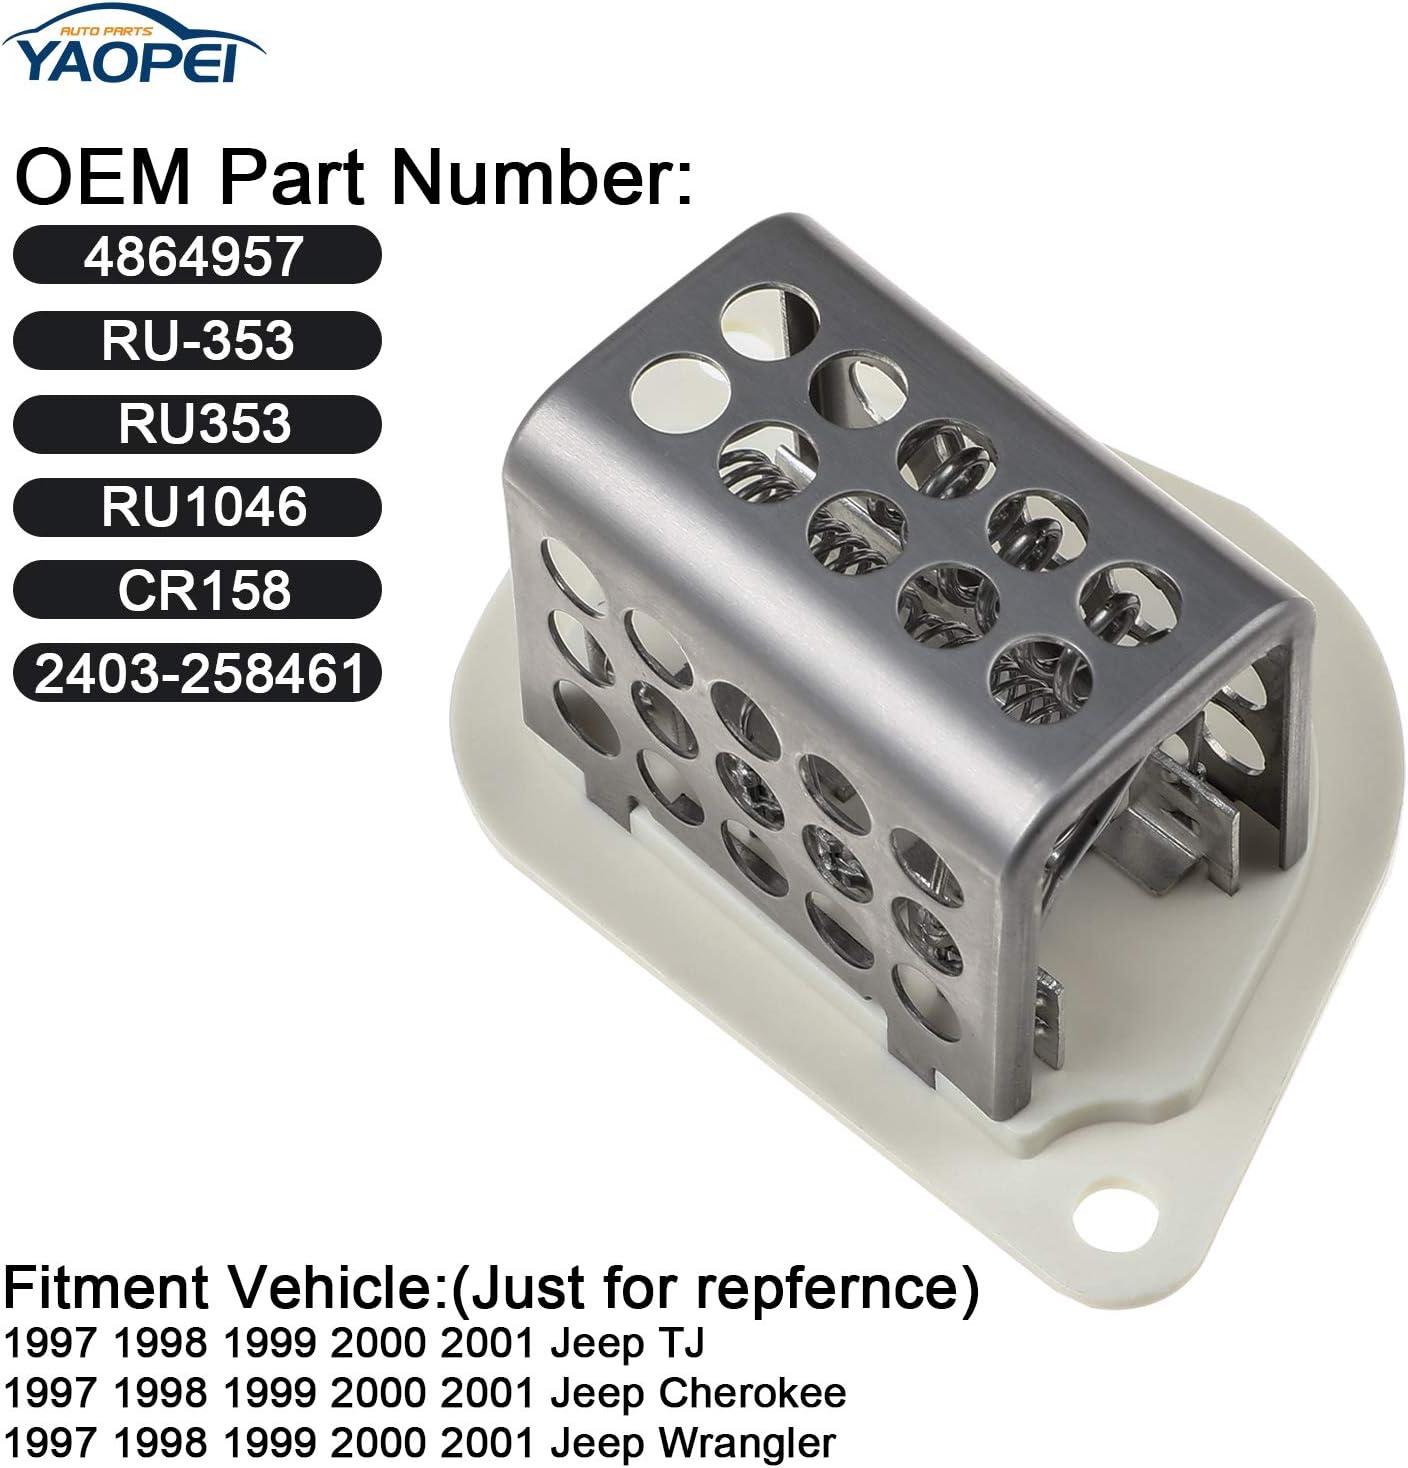 Jeep TJ Cherokee Wrangler 1997-2001,Heater Blower Motor Resistor,4864957 RU-353